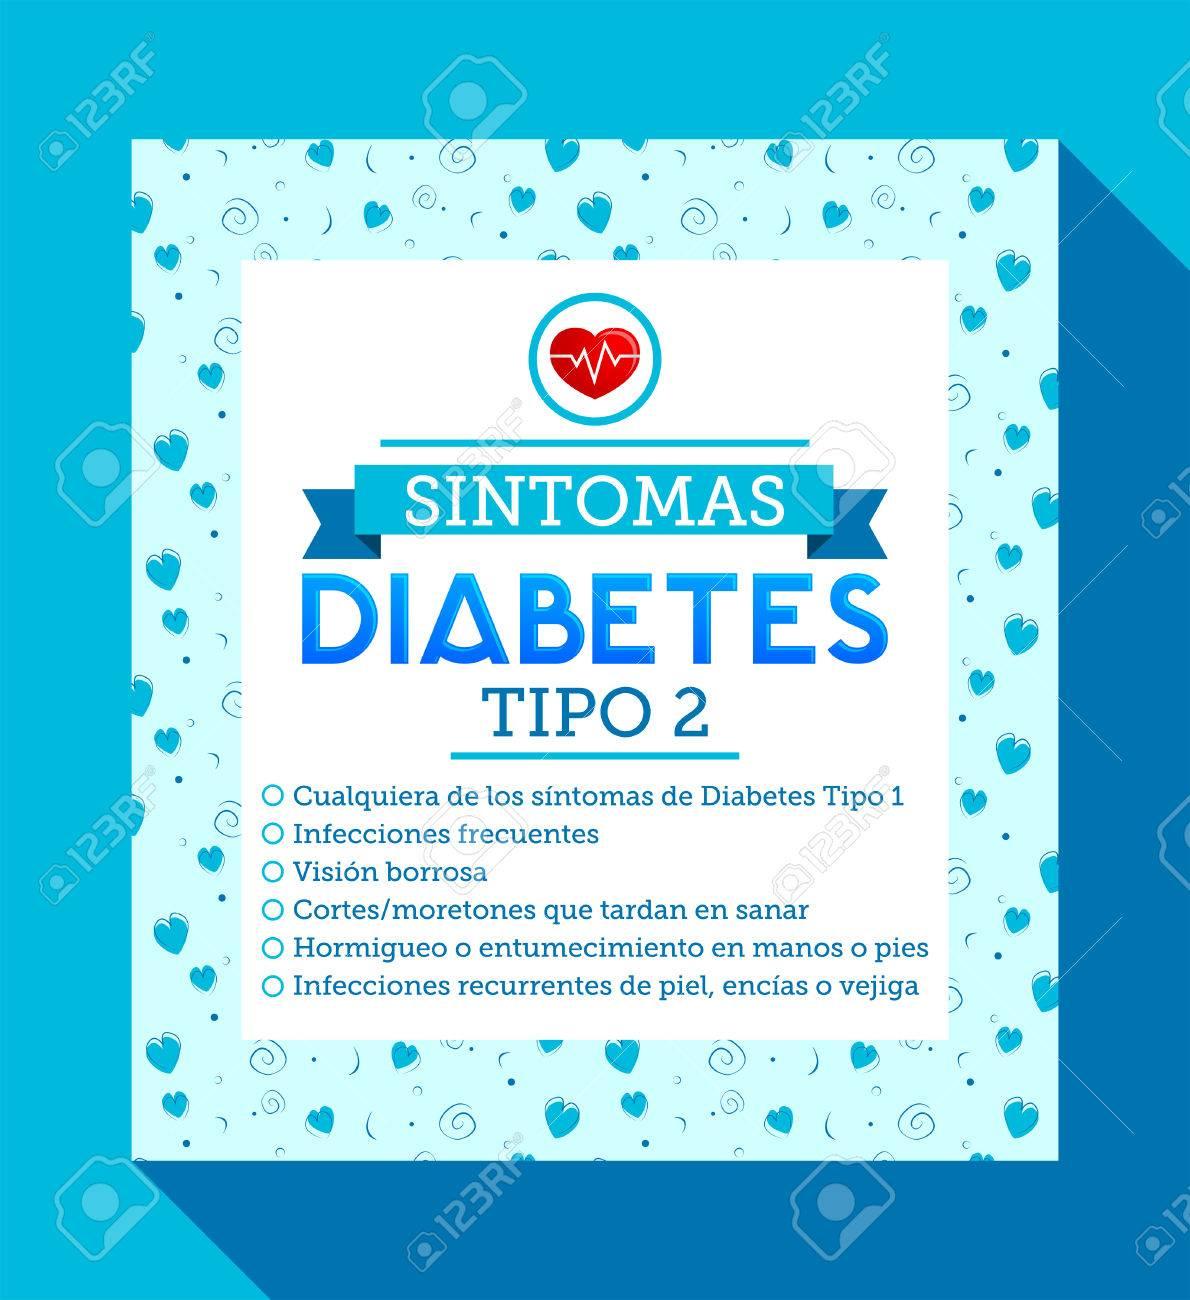 paraneoplasia síntomas de diabetes